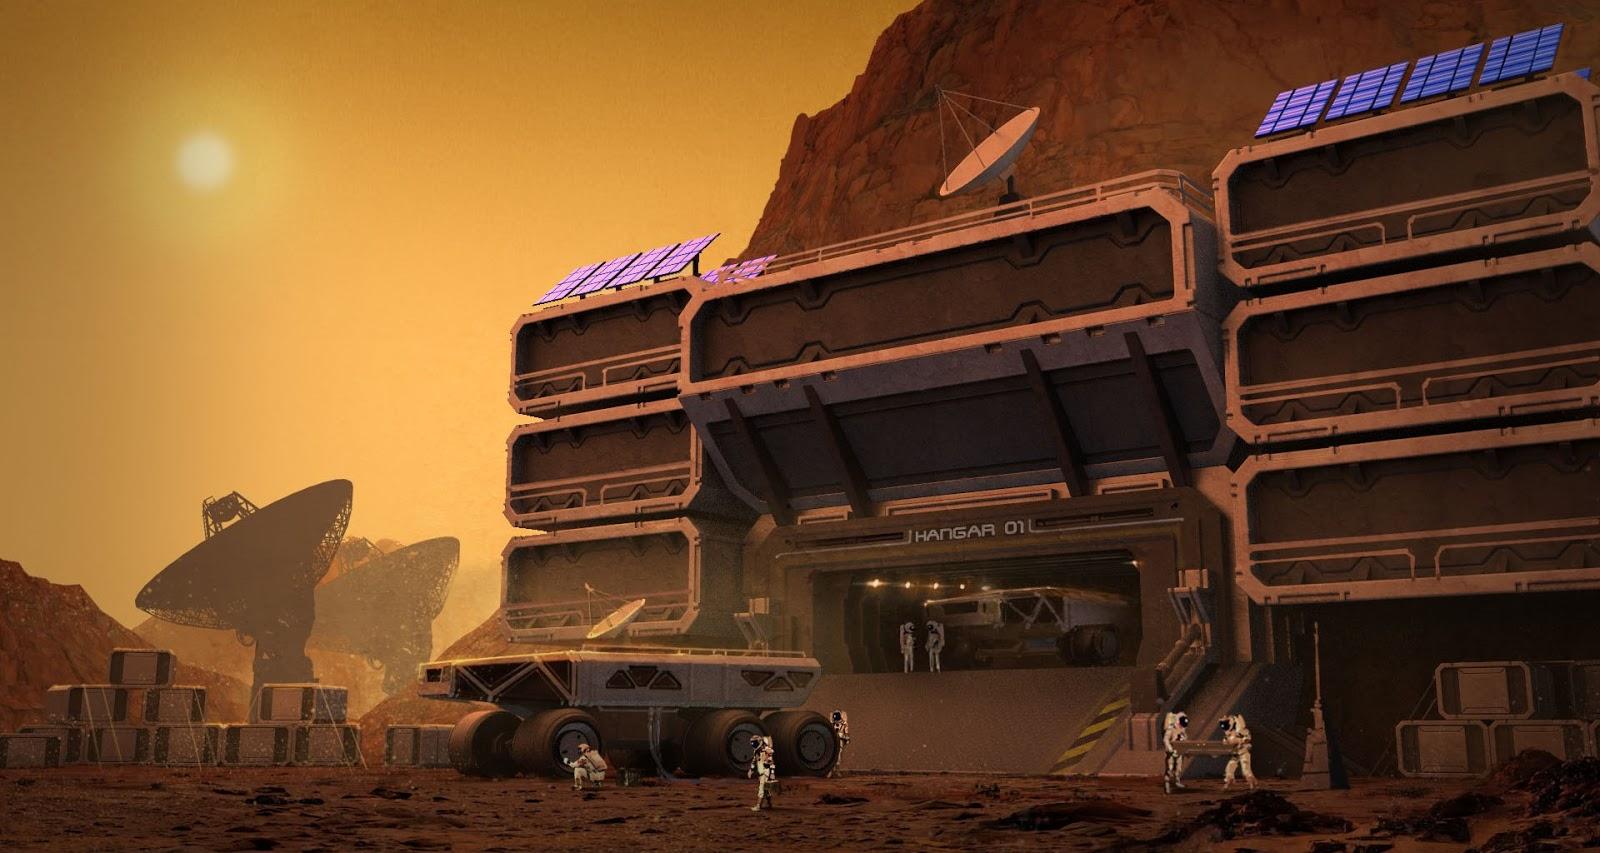 mars-base-by-george-brad